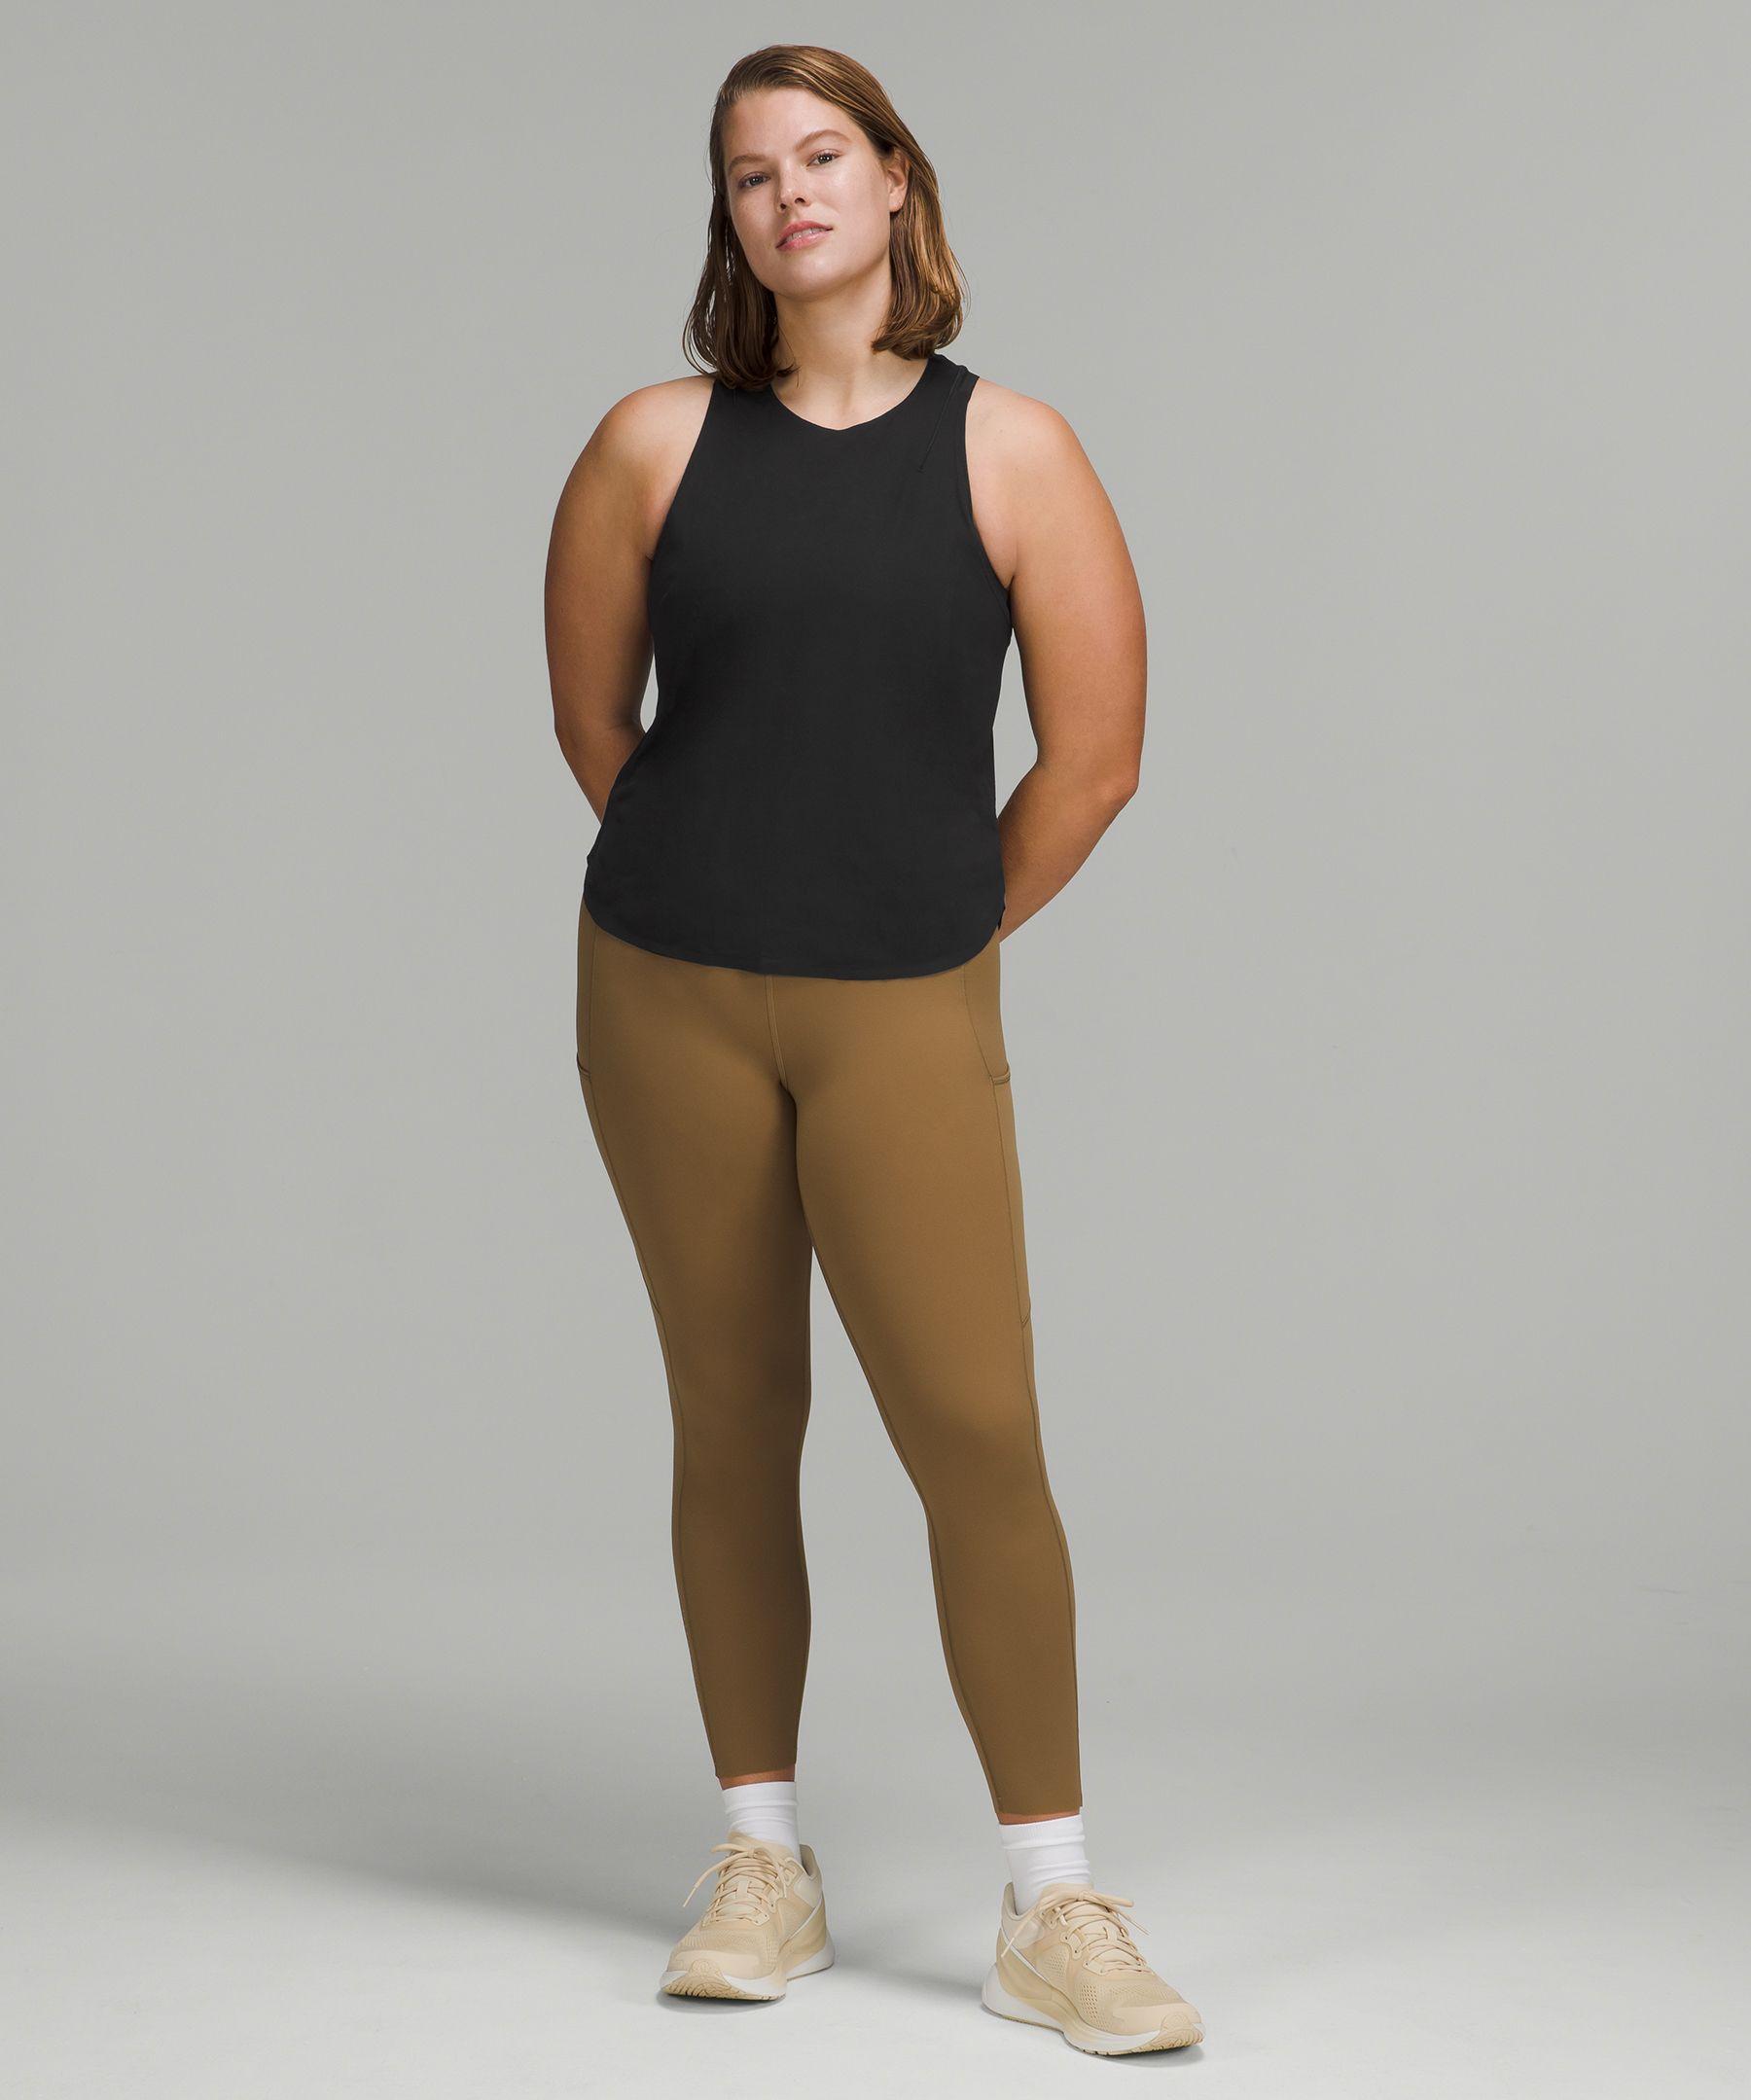 Lightweight Run Kit Tank Top